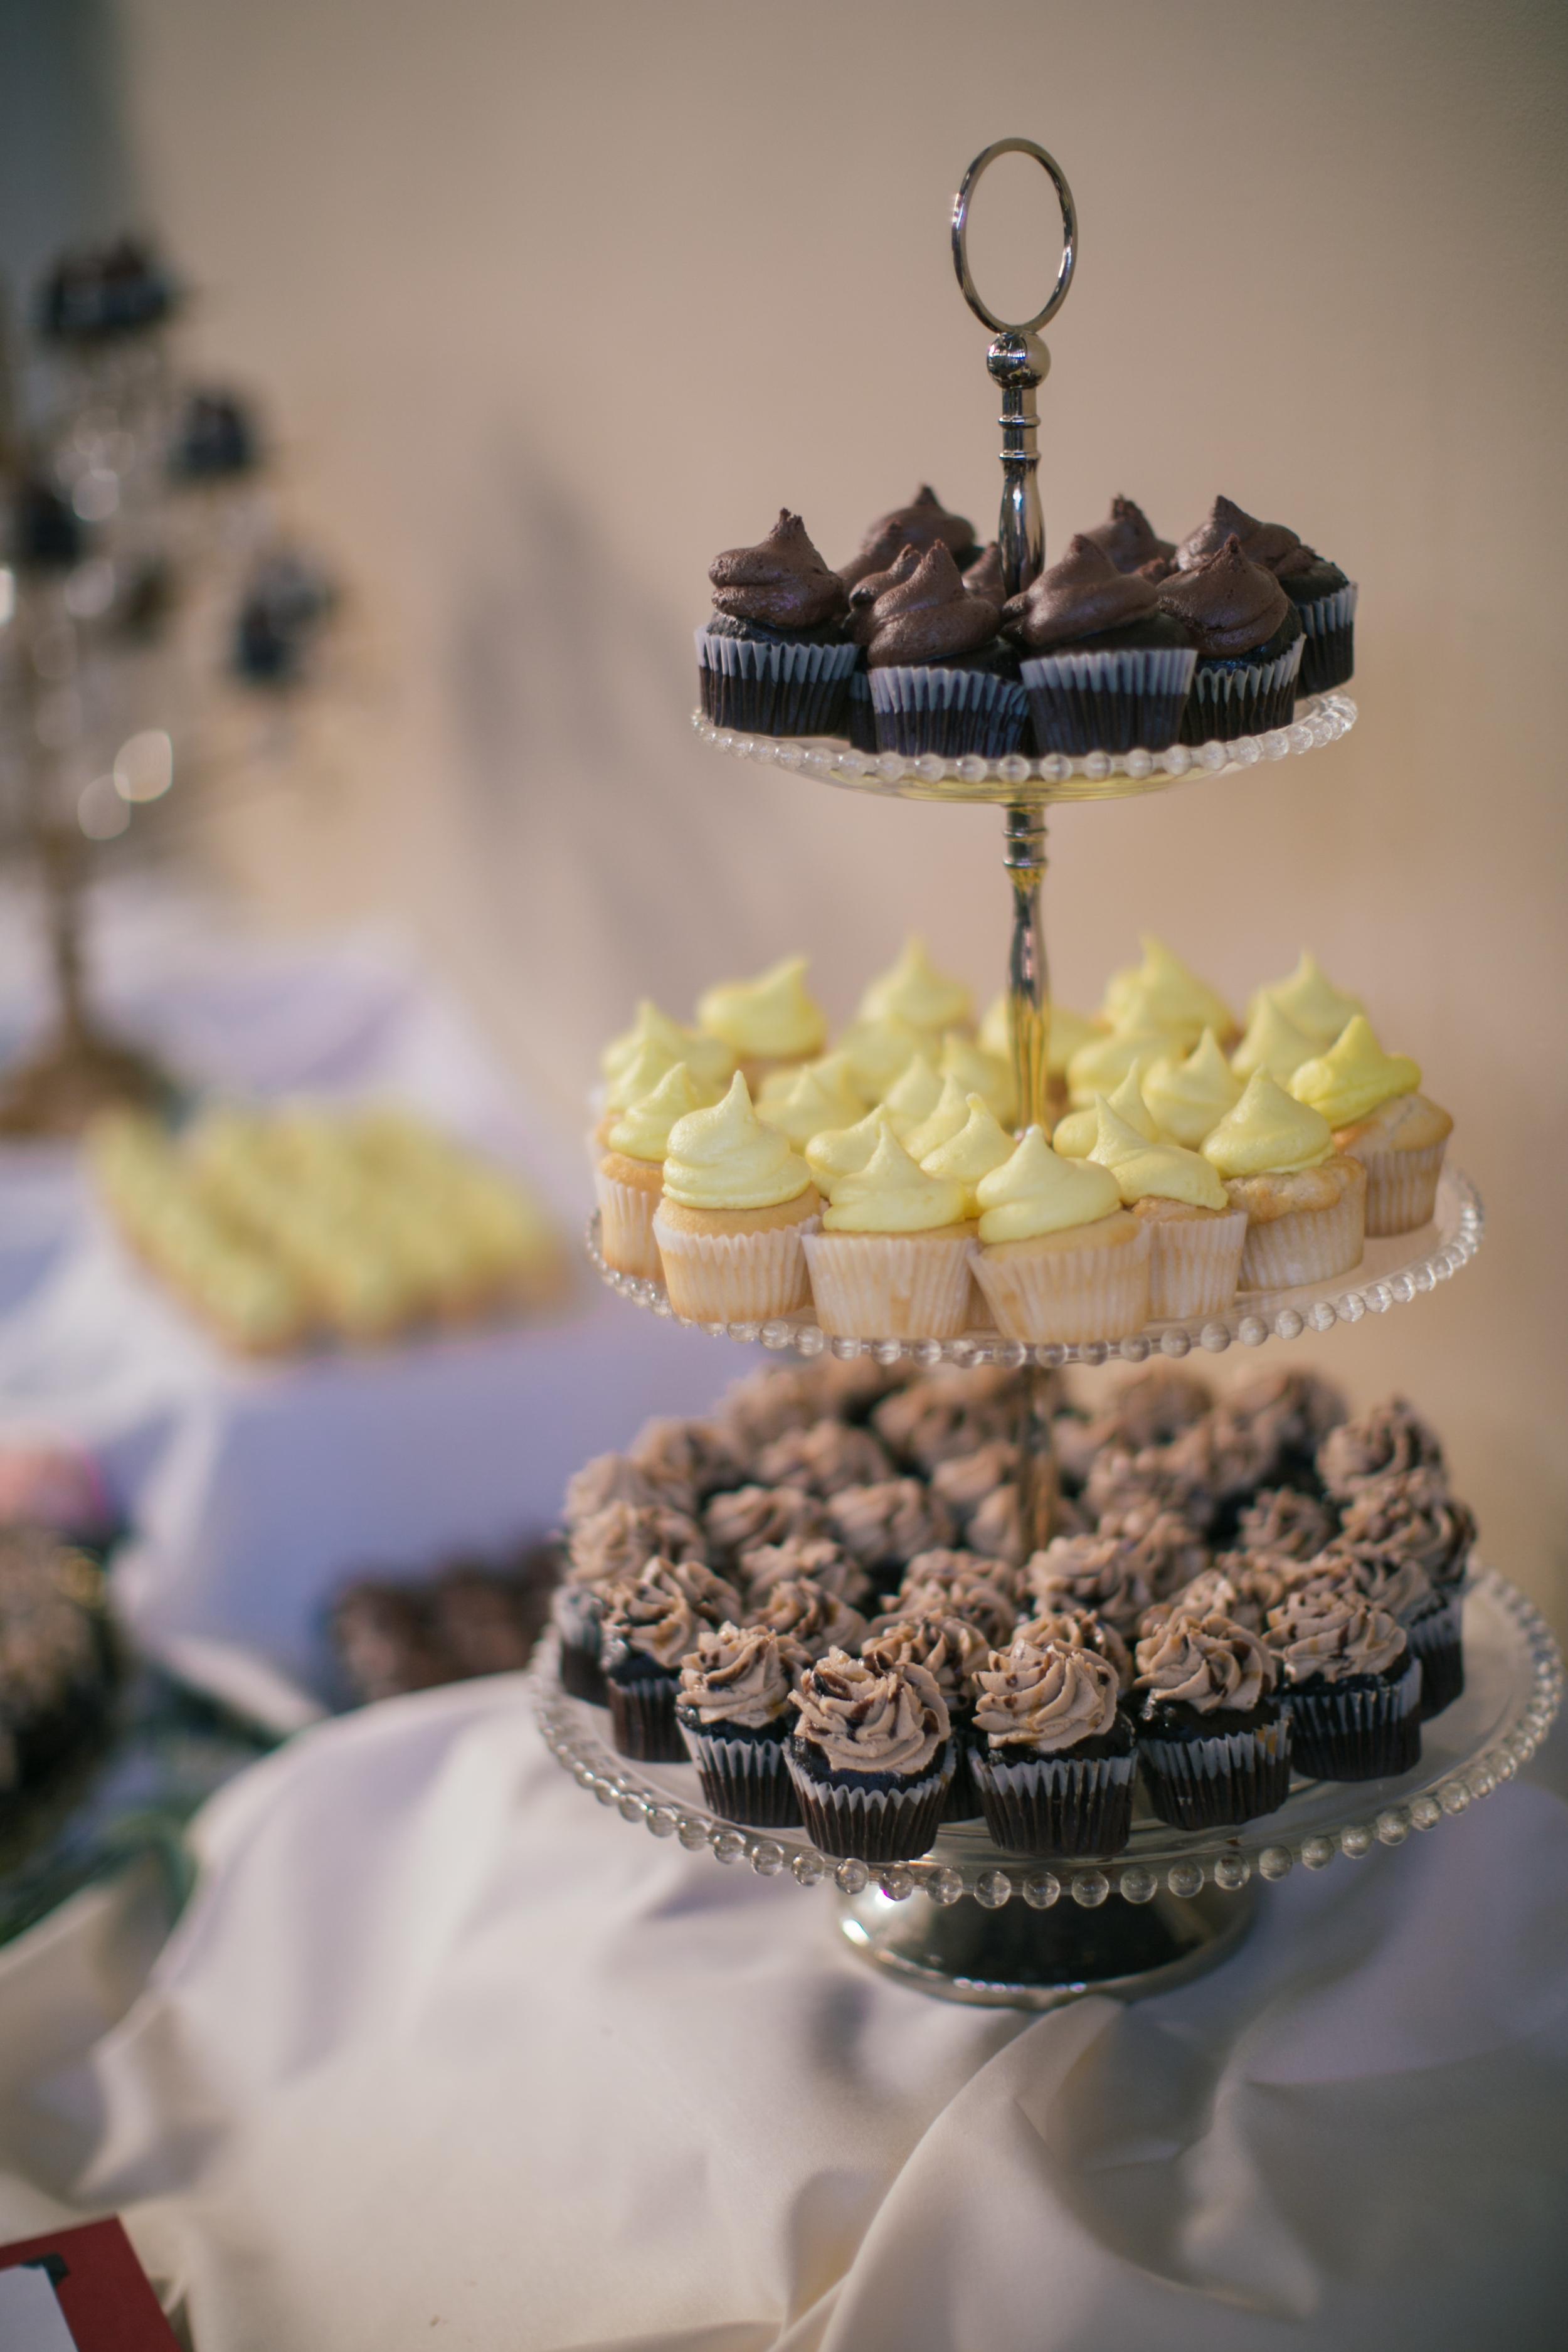 Ashley+Aaron_Acowsay_Cinema_Milwaukee_Wisconsin_Wedding_Cupcakes.jpg